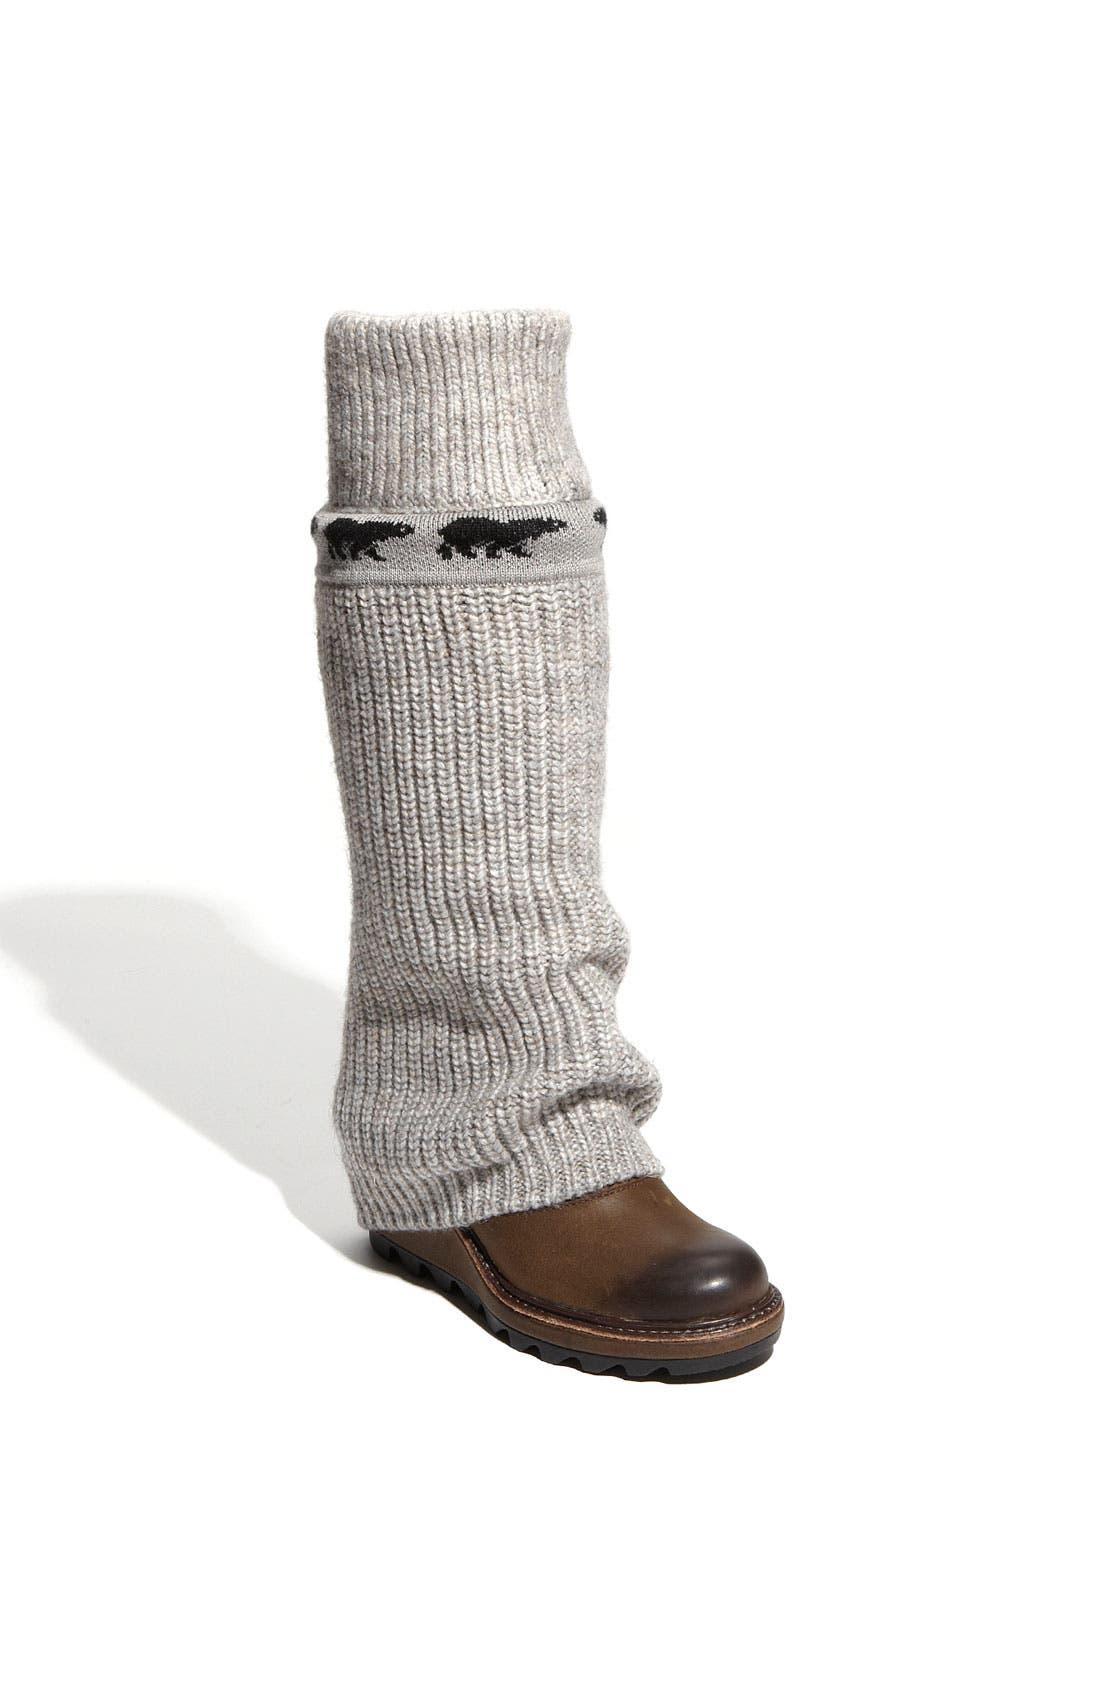 Main Image - Sorel 'Crazy Cabel' Wedge Boot